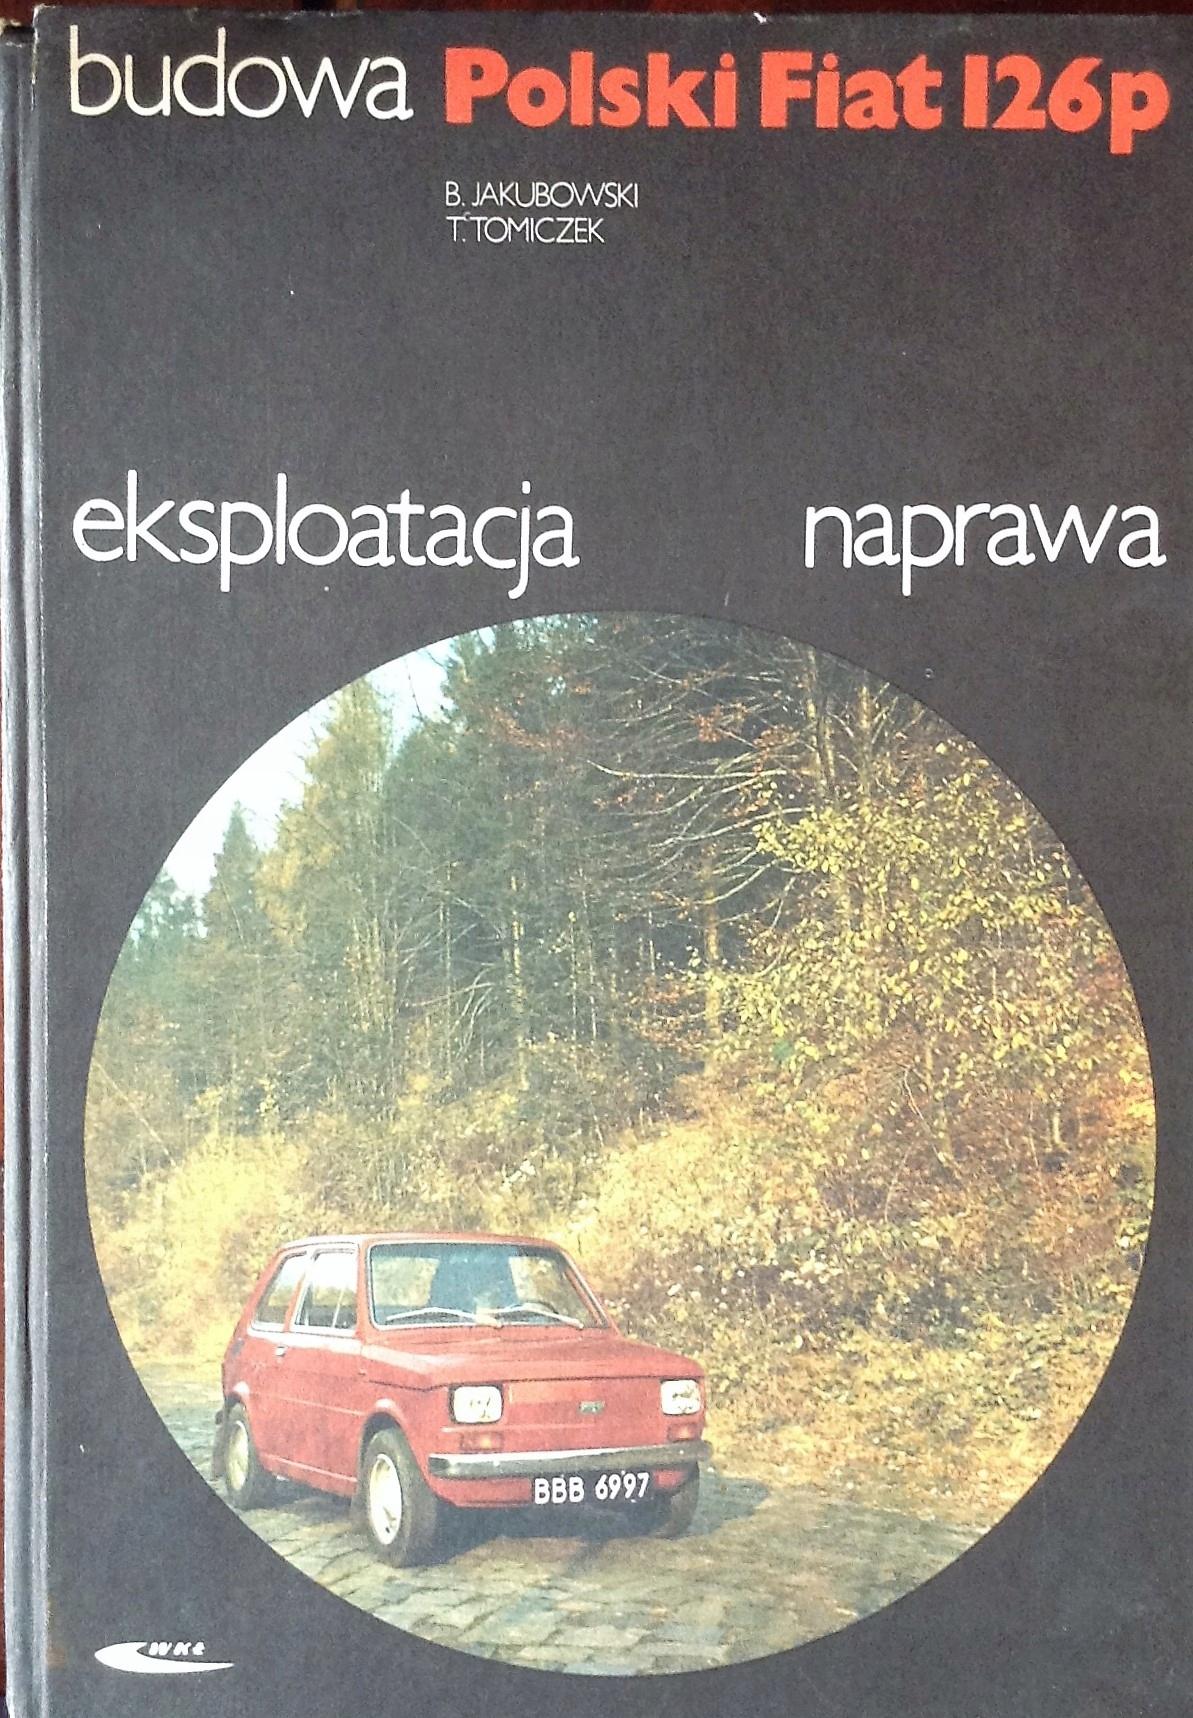 Jakubowski, Tomiczek - Polski Fiat 126p